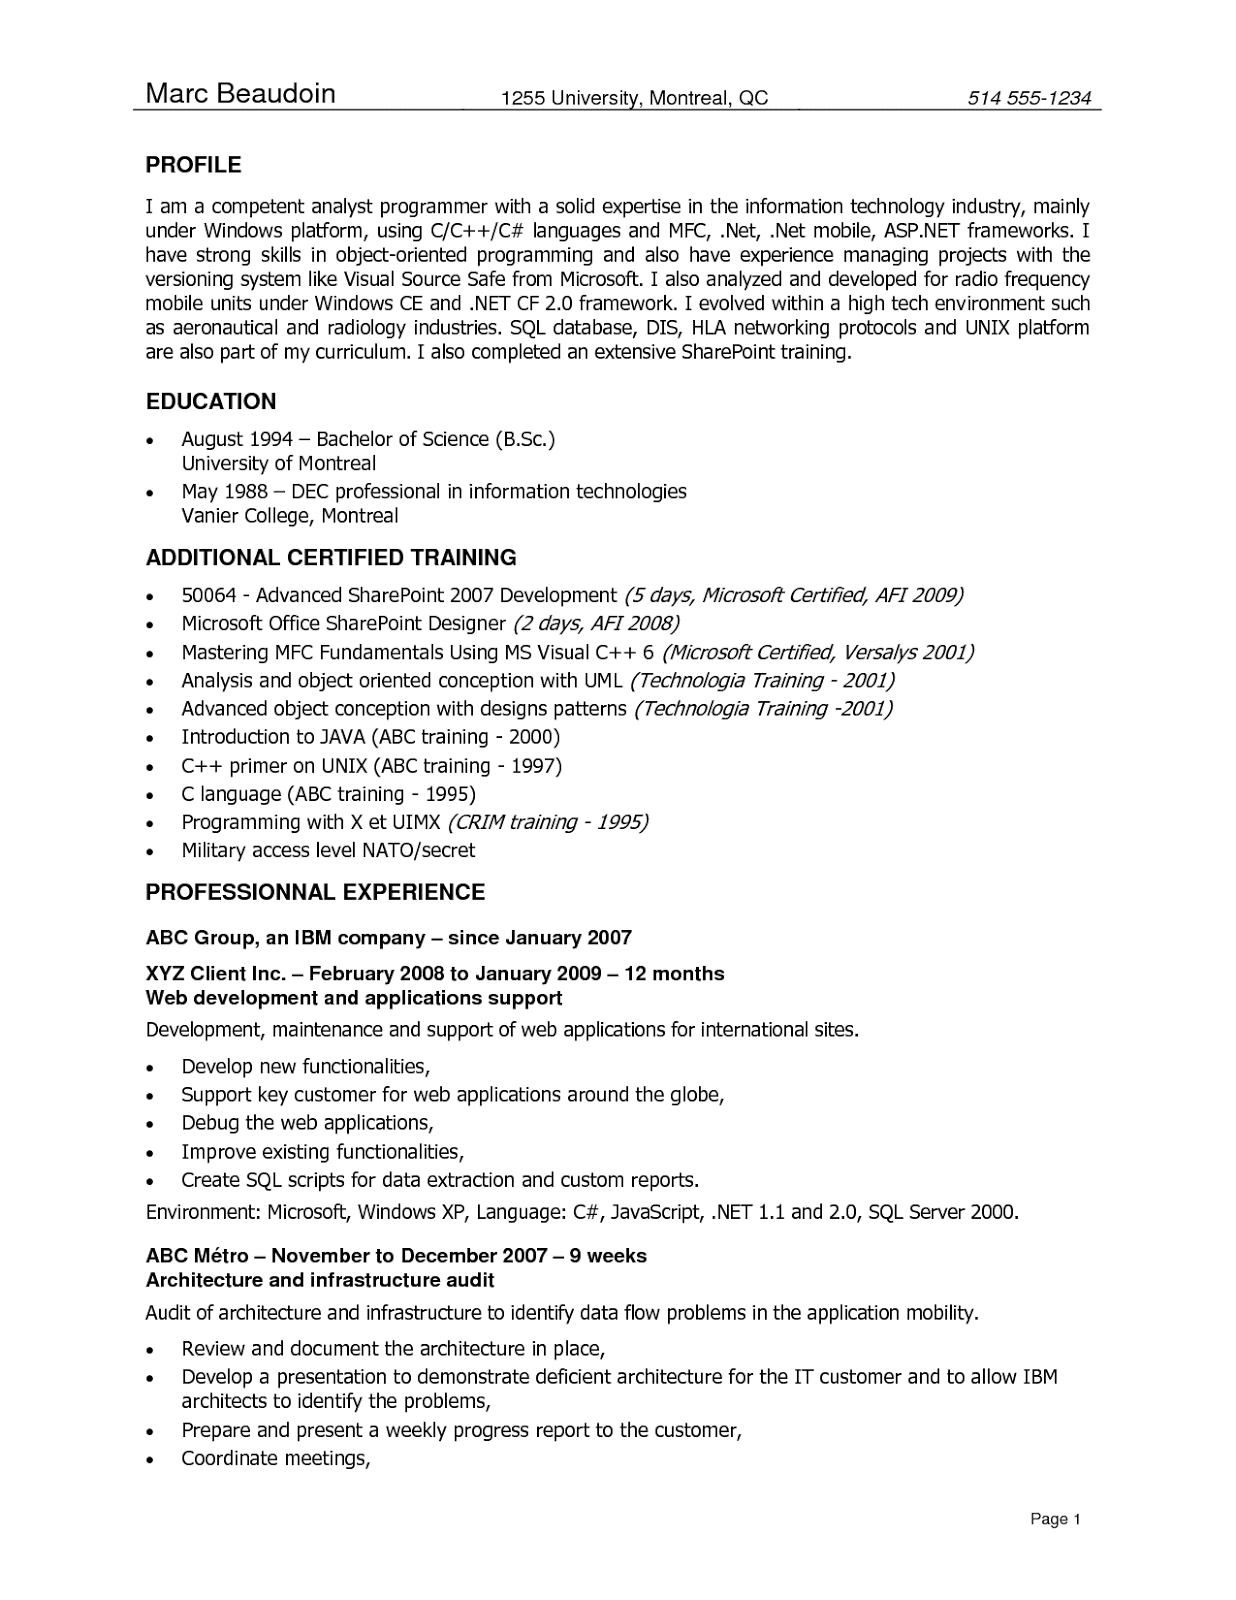 2 years experience resume  scribd india